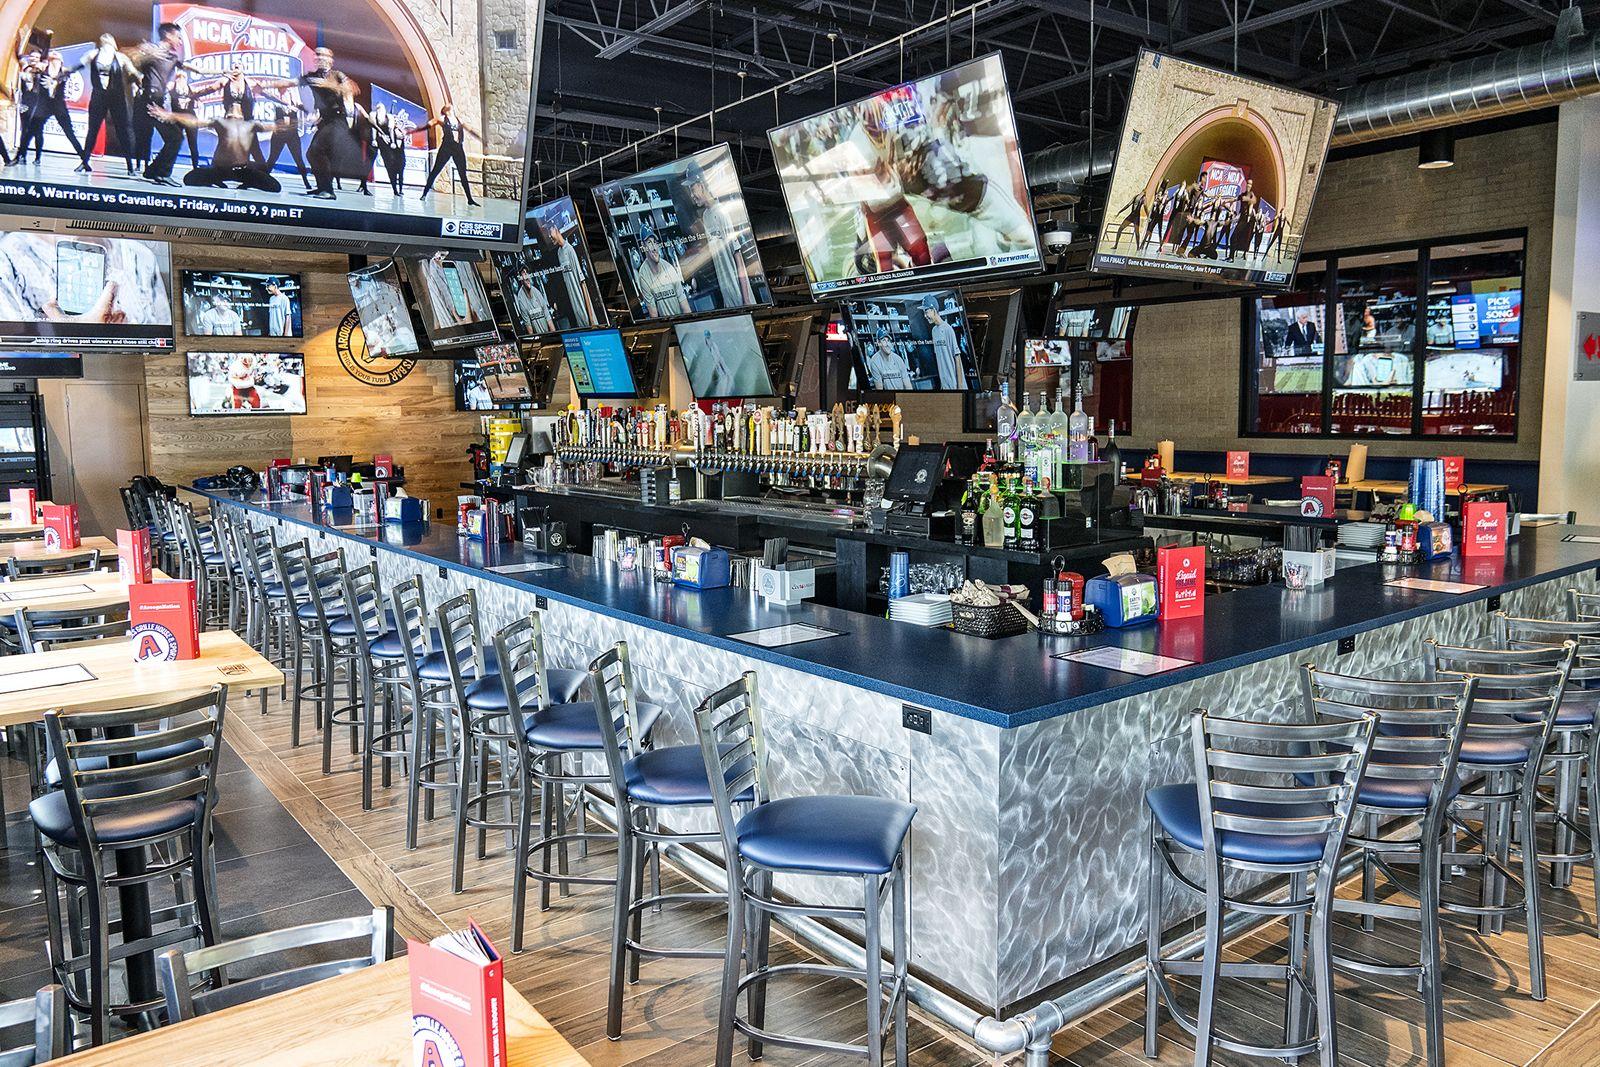 Arooga's Grille House & Sports Bar Recognized Among Entrepreneur 2021 Top Food Franchises